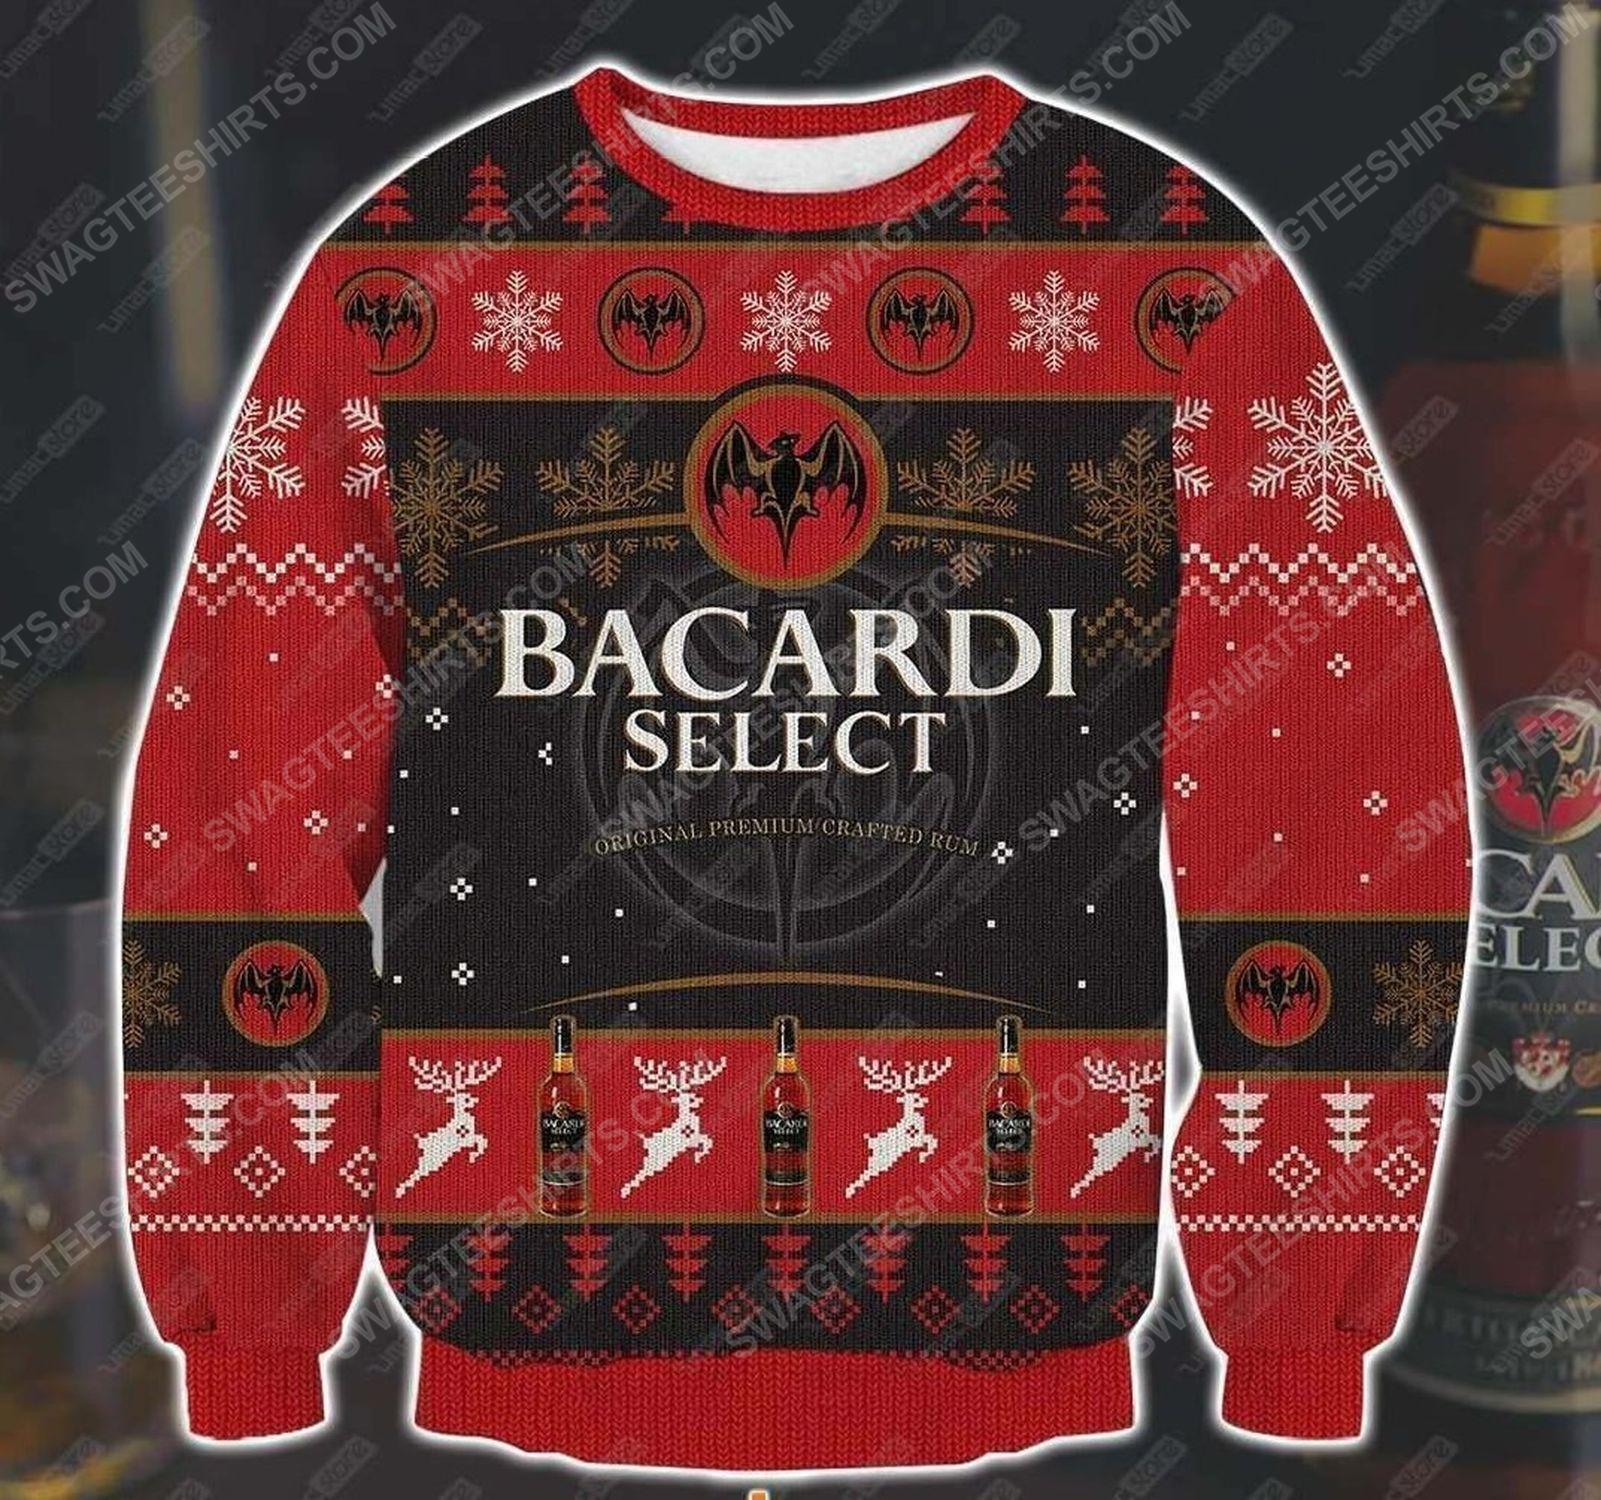 Bacardi select dark rum ugly christmas sweater